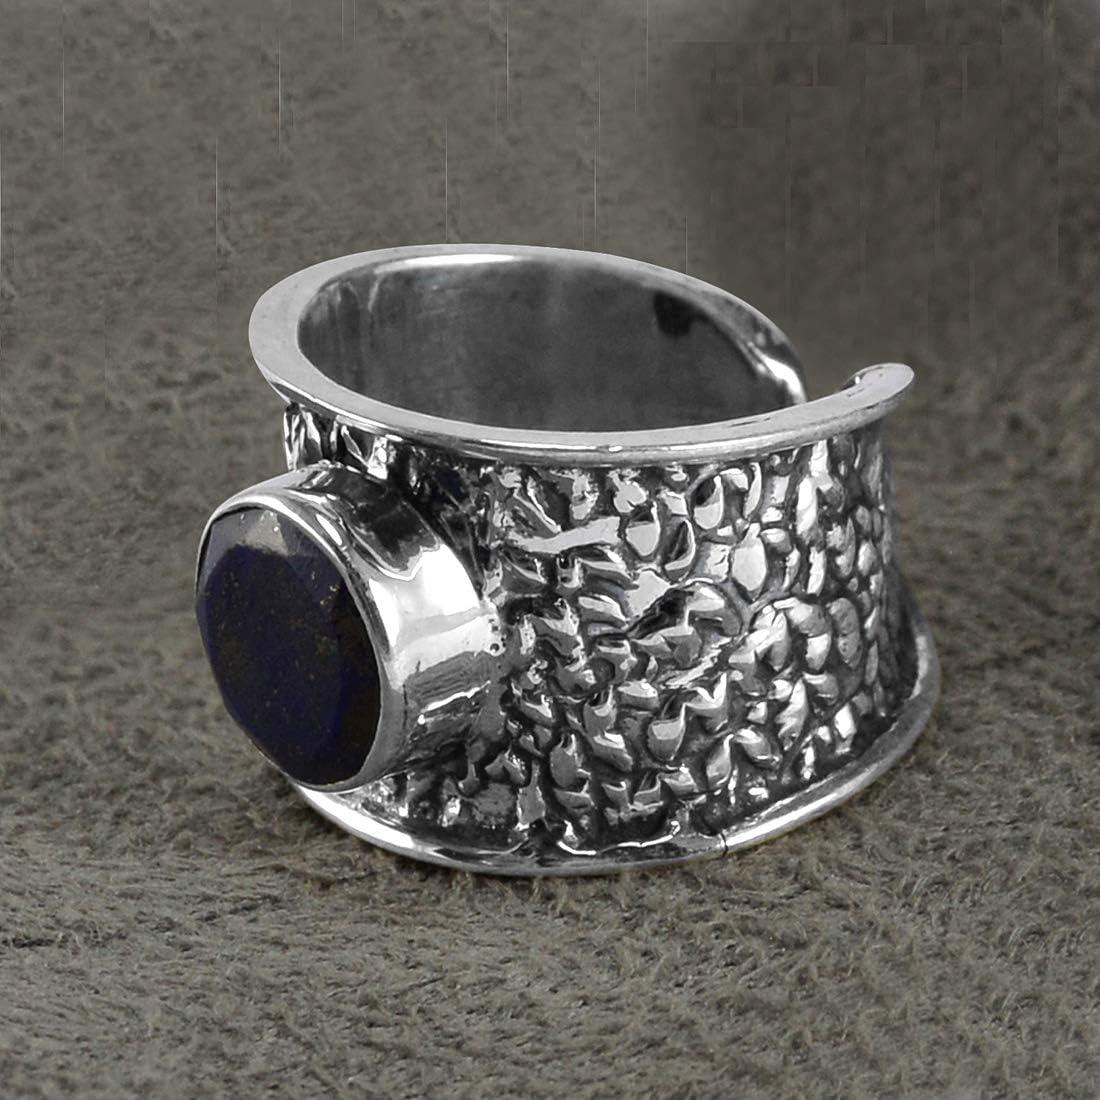 Saamarth Impex Lapis Lazuli 925 Sterling Silver Ring Sz 7.5 Adjustable PG-155753